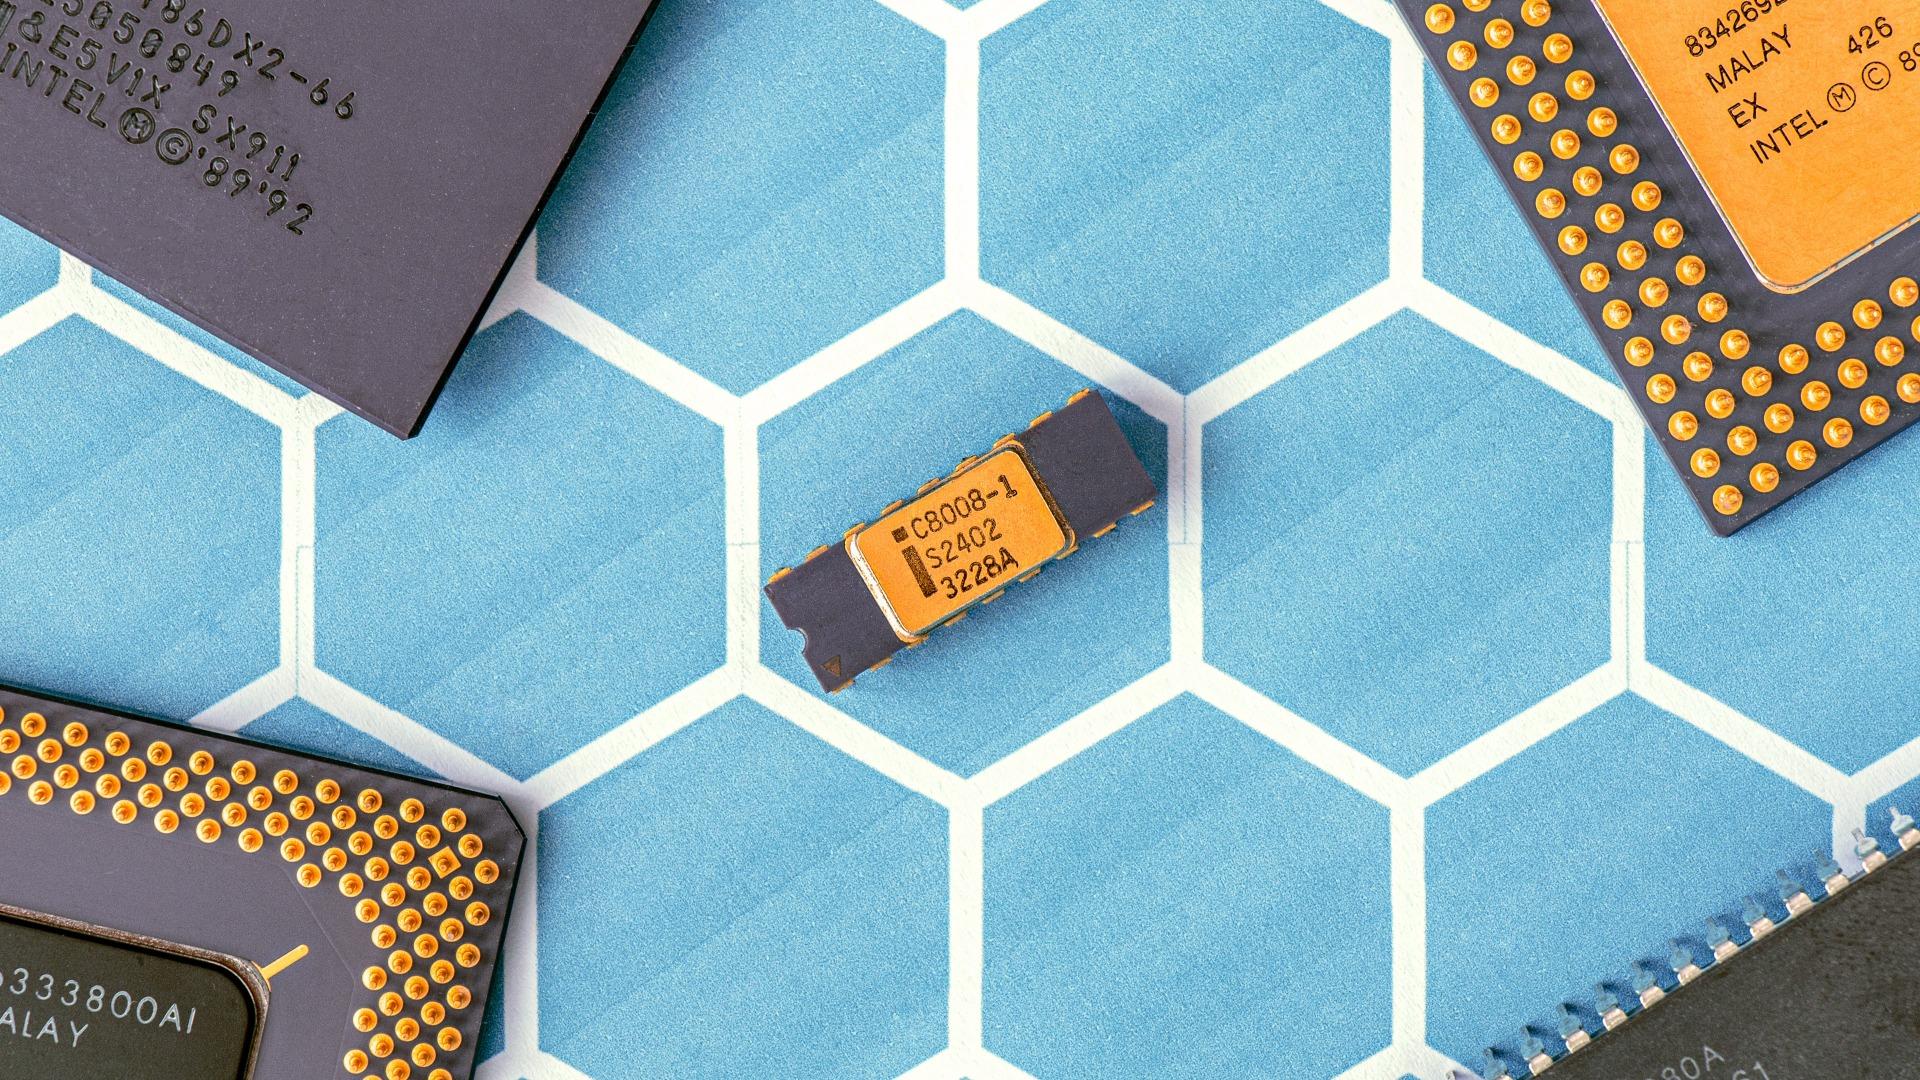 Assorted Microchips